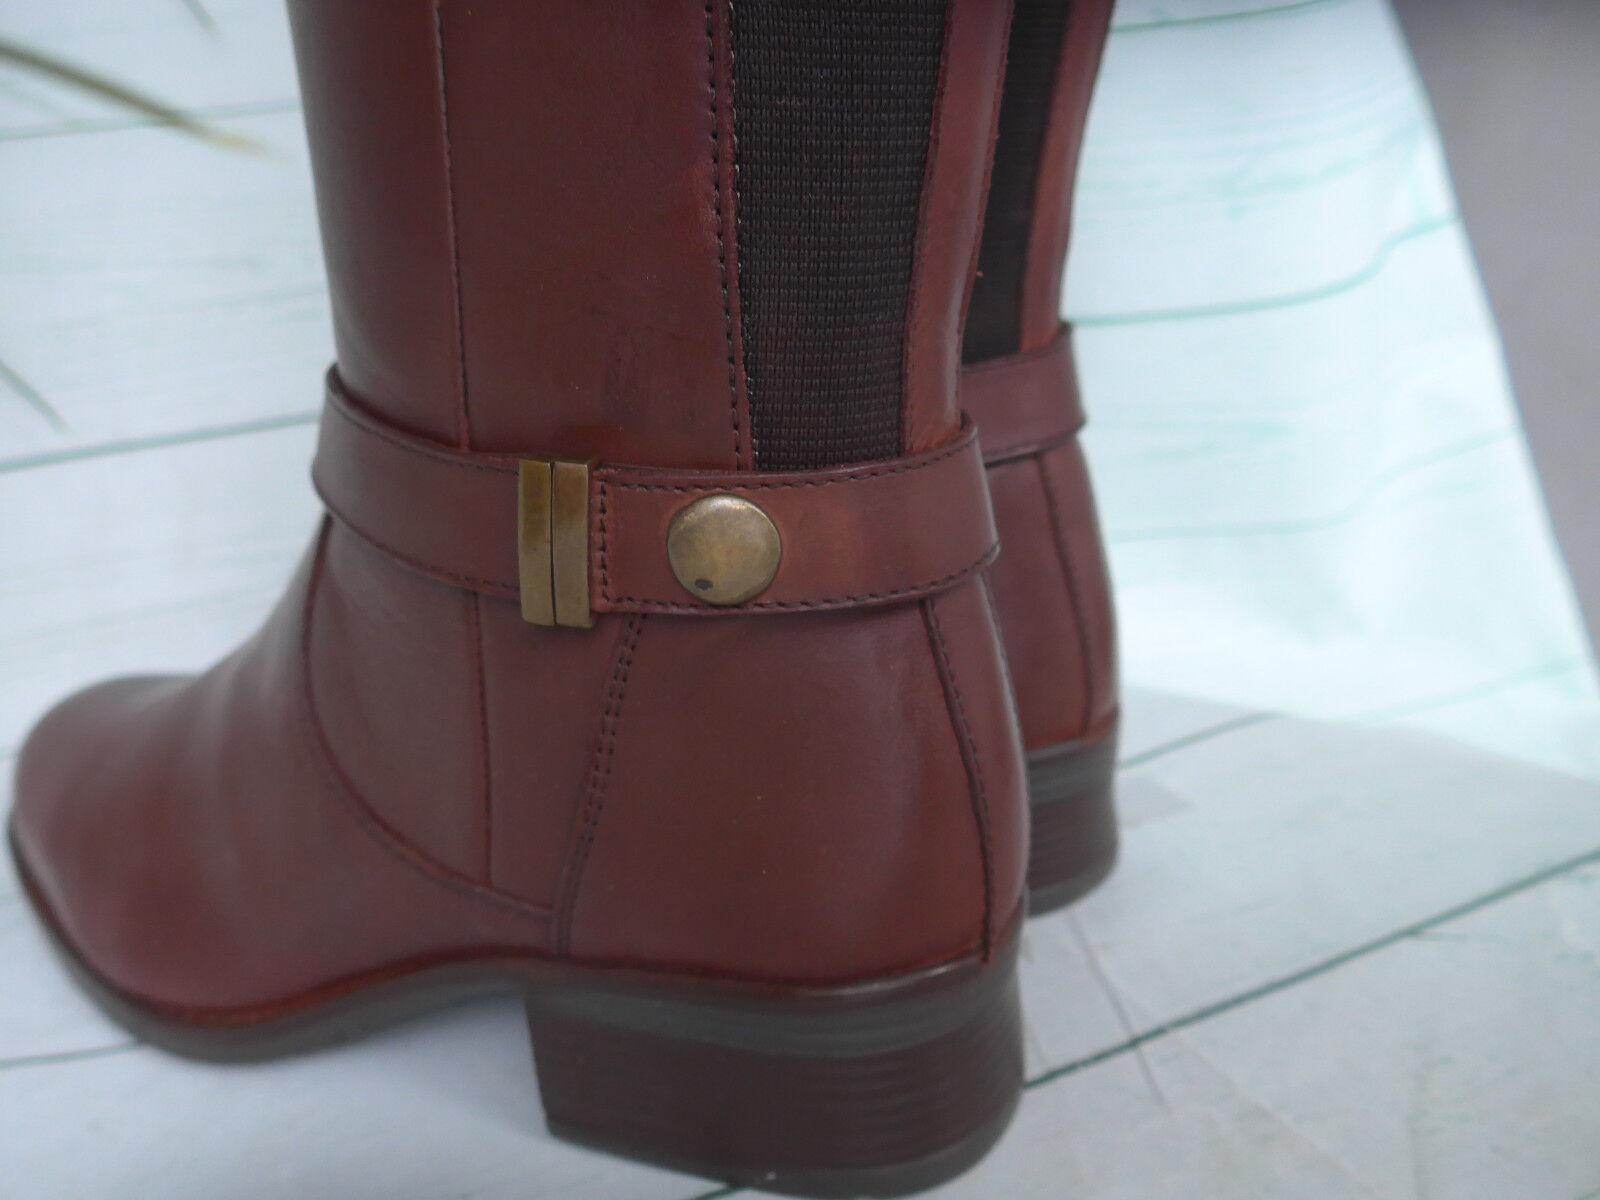 Sheego Stivali da Donna in Pelle XL GAMBALE GAMBALE GAMBALE STIVALI TG. 38 a 44 Marronee Nuovo (598) | Prezzo Pazzesco  | Uomini/Donna Scarpa  25684b